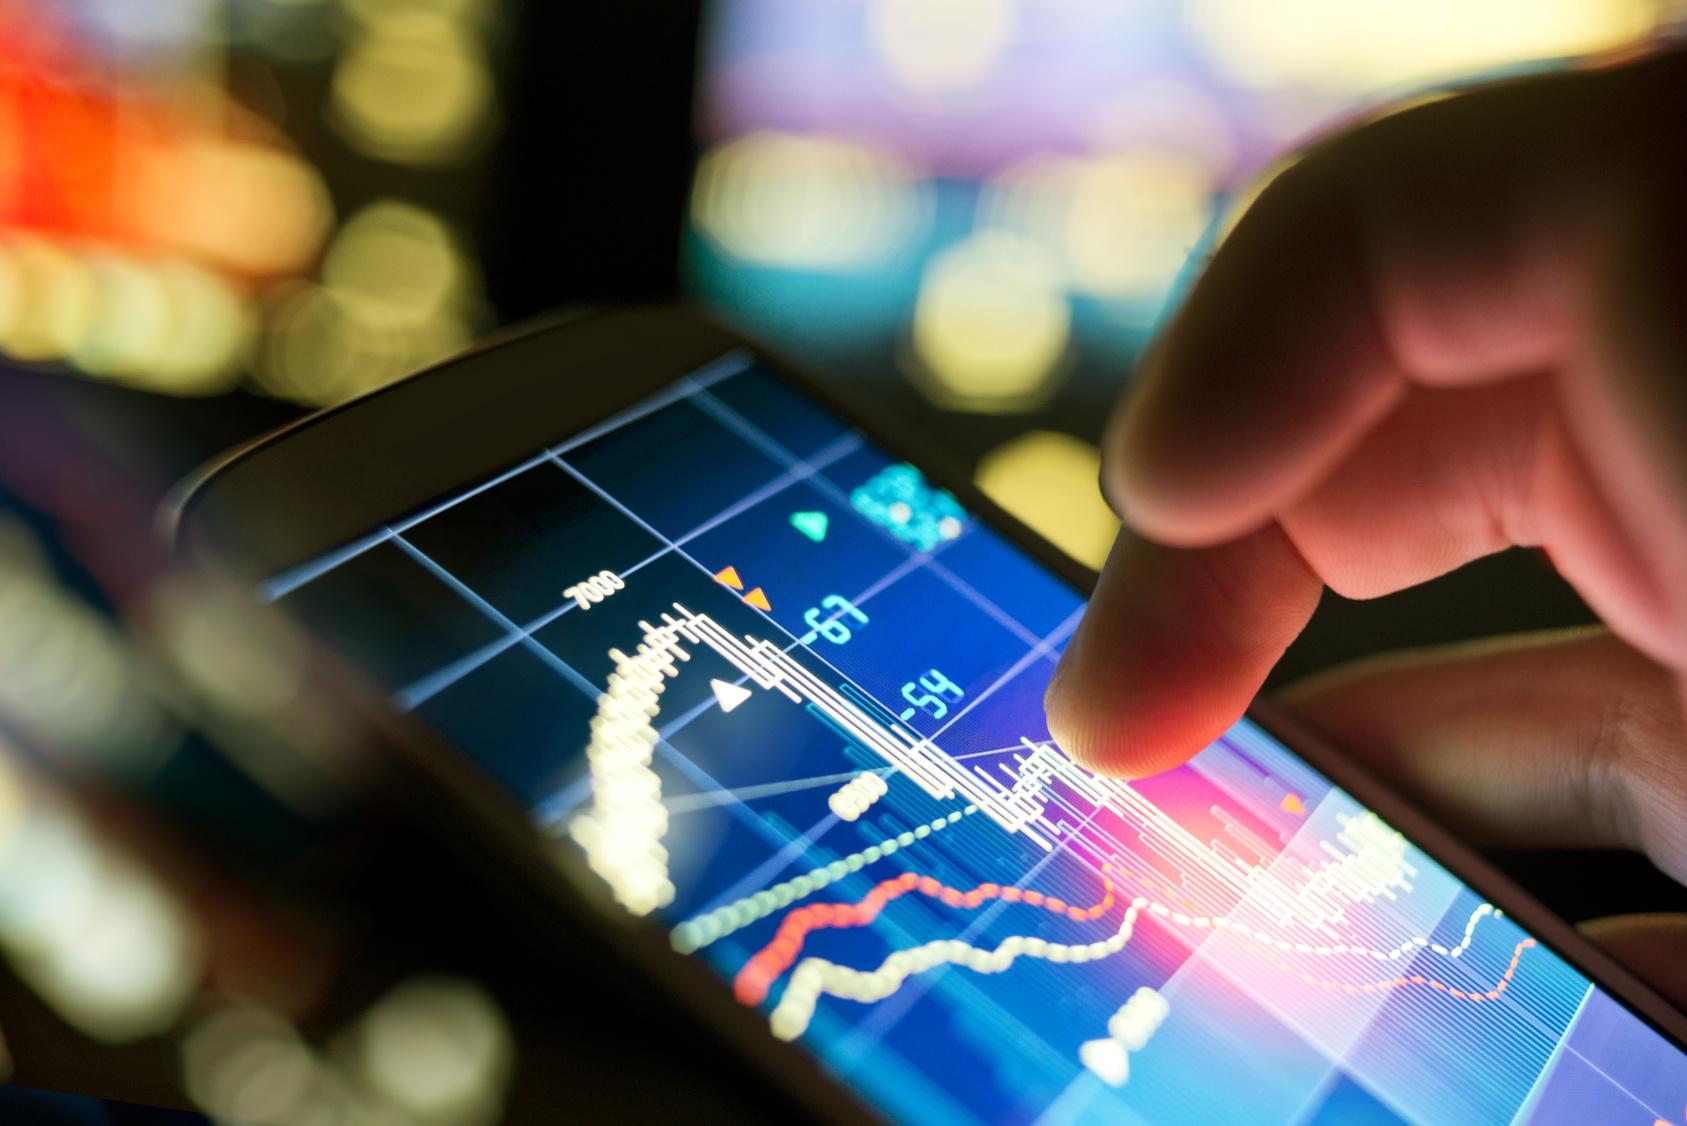 El Mobile World Congress reporta de beneficios más de 500 millones de euros directos e indirectos